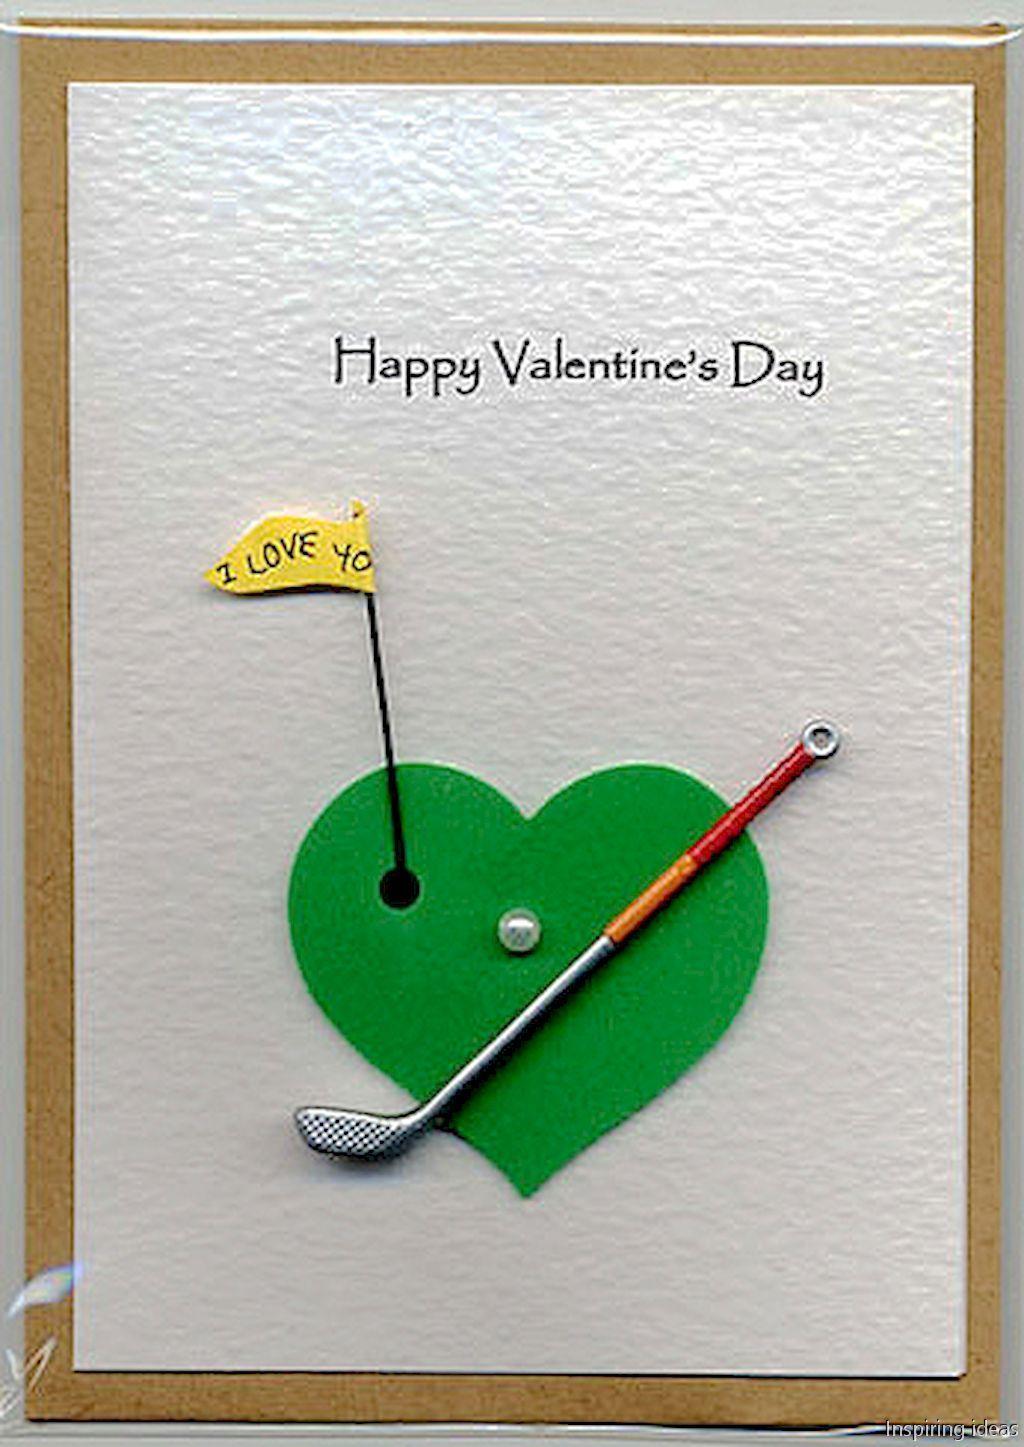 65 Unforgettable Valentine Cards Ideas Homemade | Cards, Card ideas ...